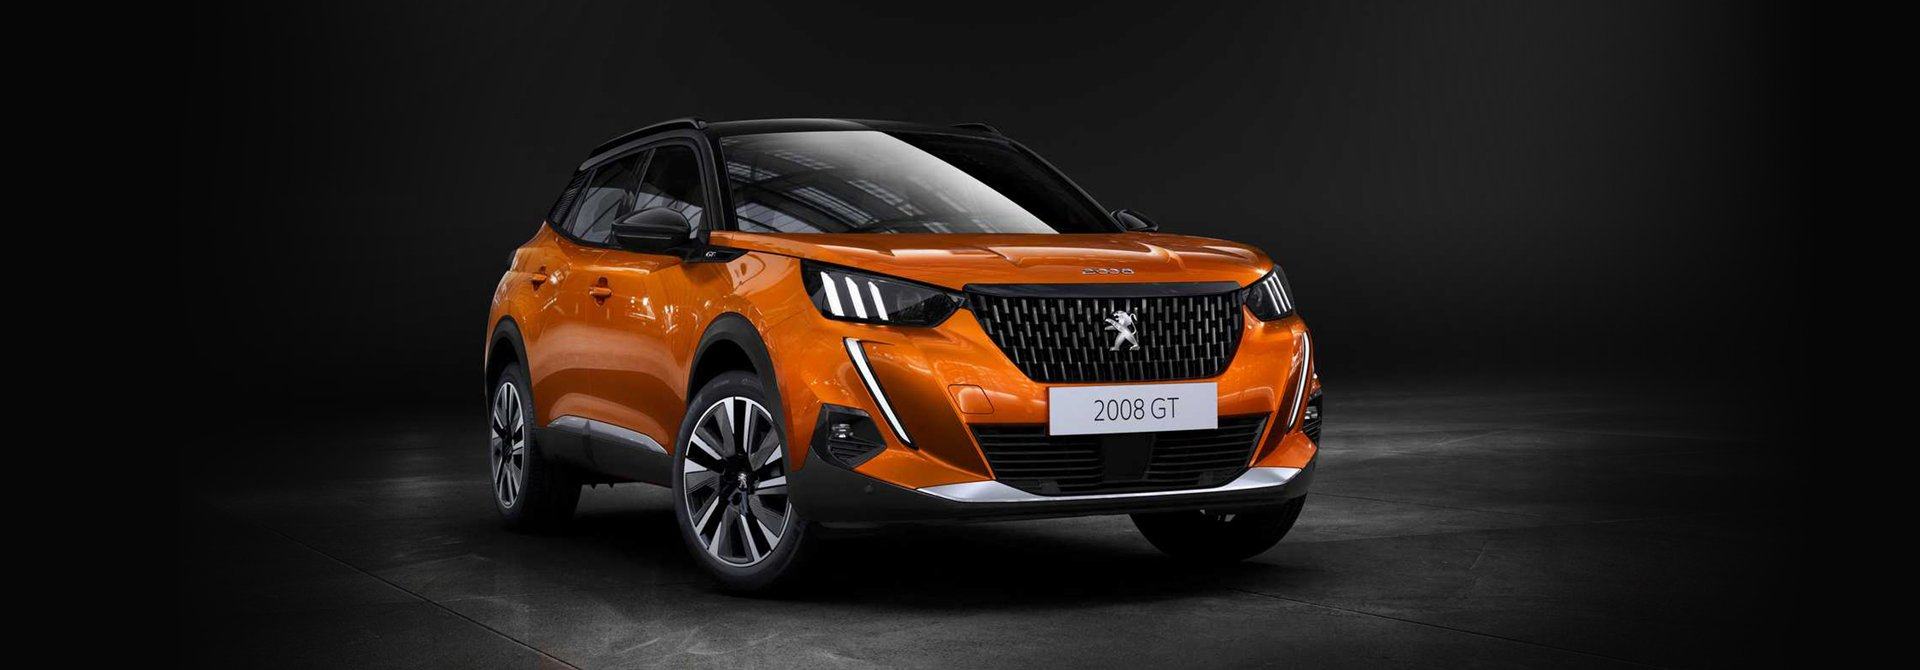 Nový Peugeot 2008: Unboring the future